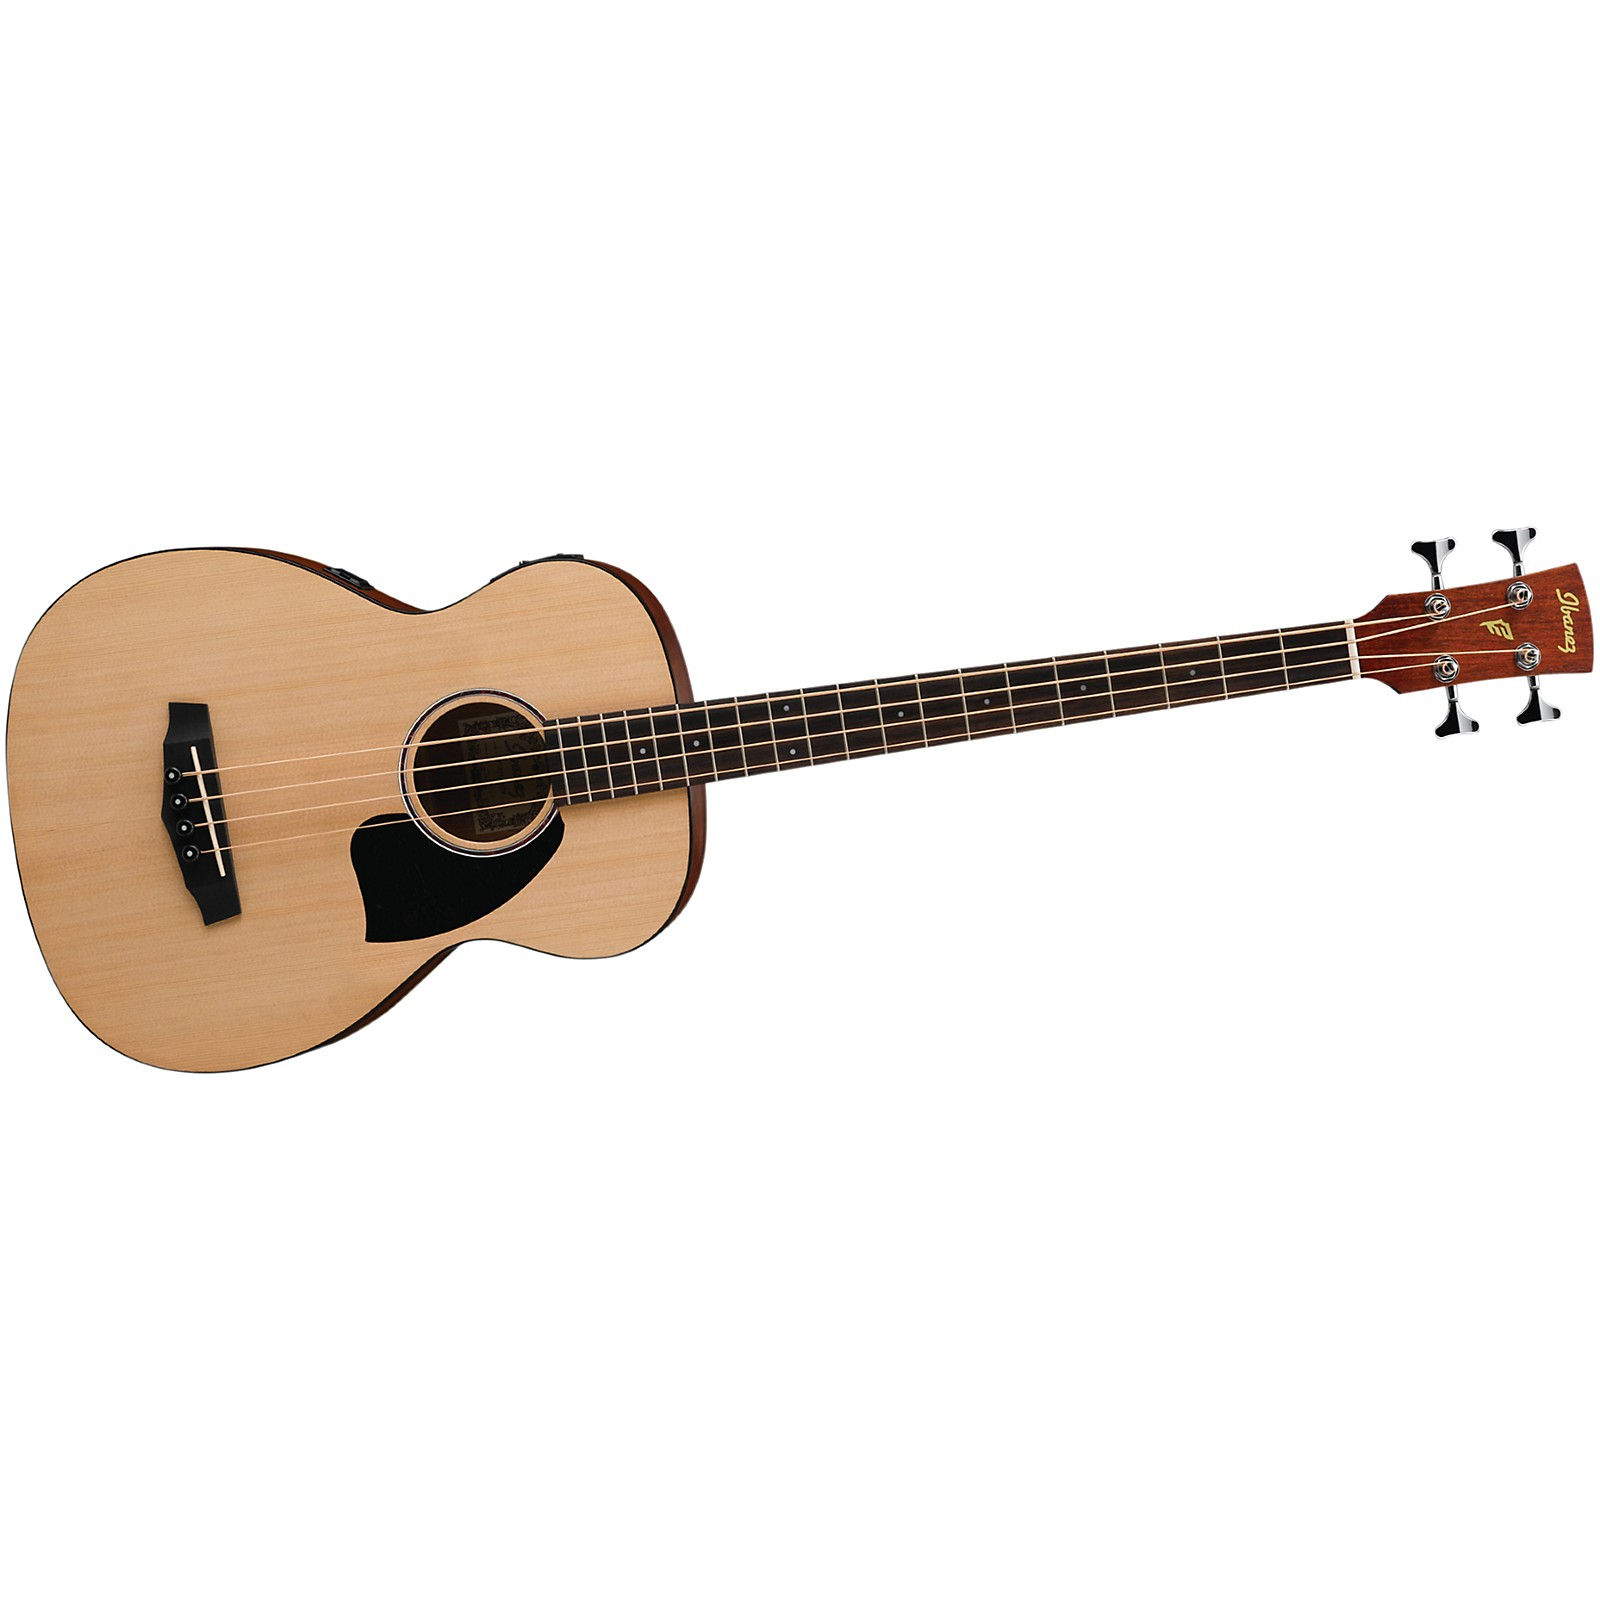 Ibanez PCBE12 Grand Concert Acoustic-Electric Bass Guitar